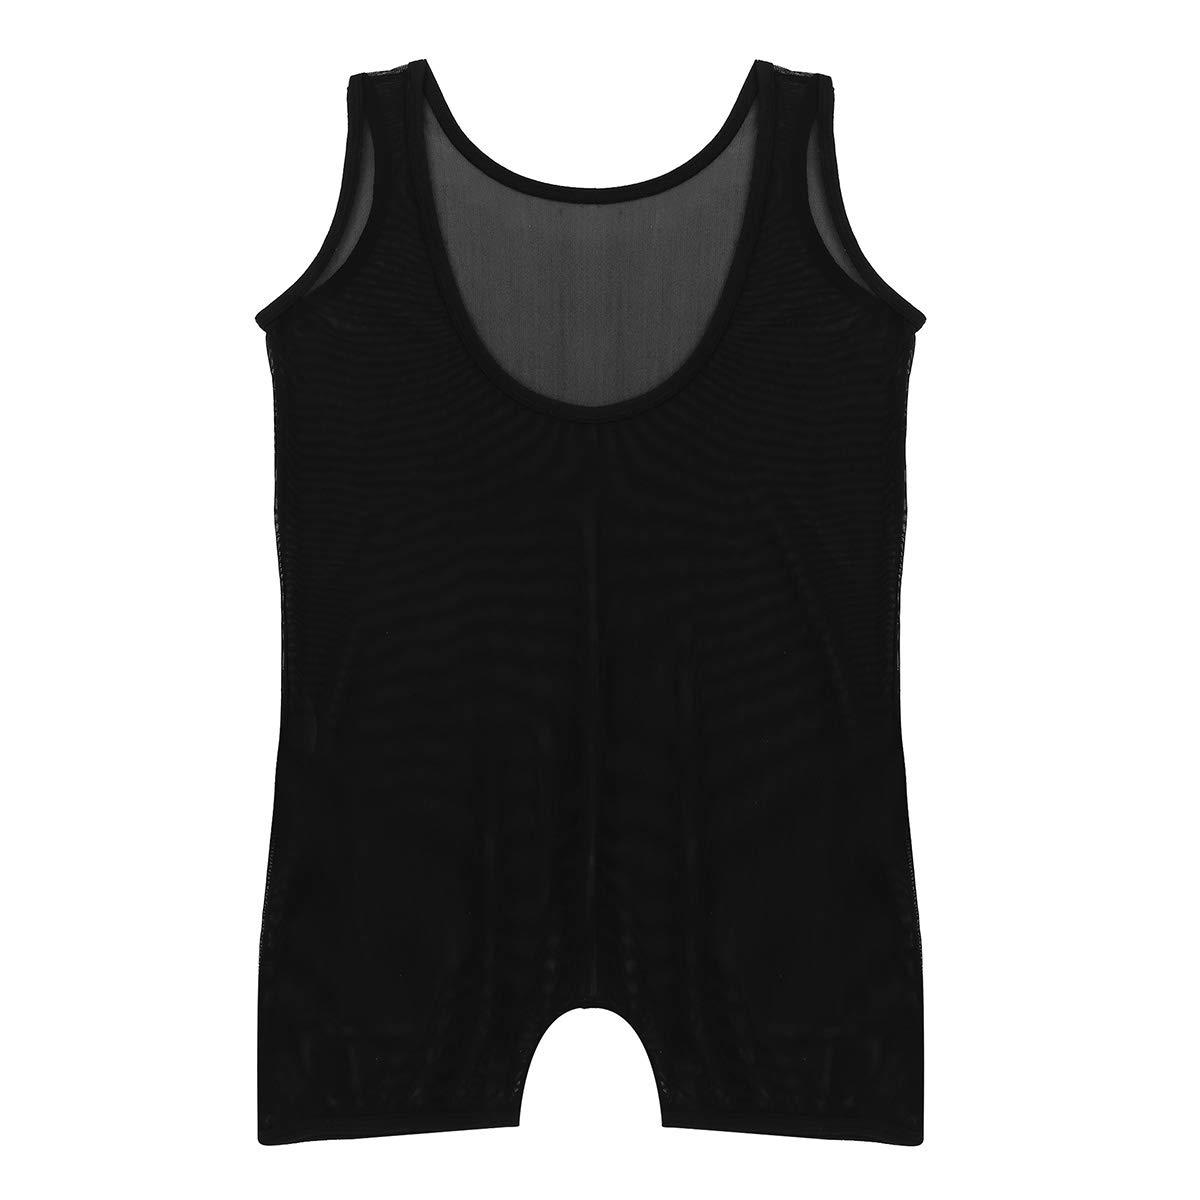 winying Mens One Piece Mesh Sheer Sleeveless Scoop Neck Leotard Bodysuit Lingerie Underwear